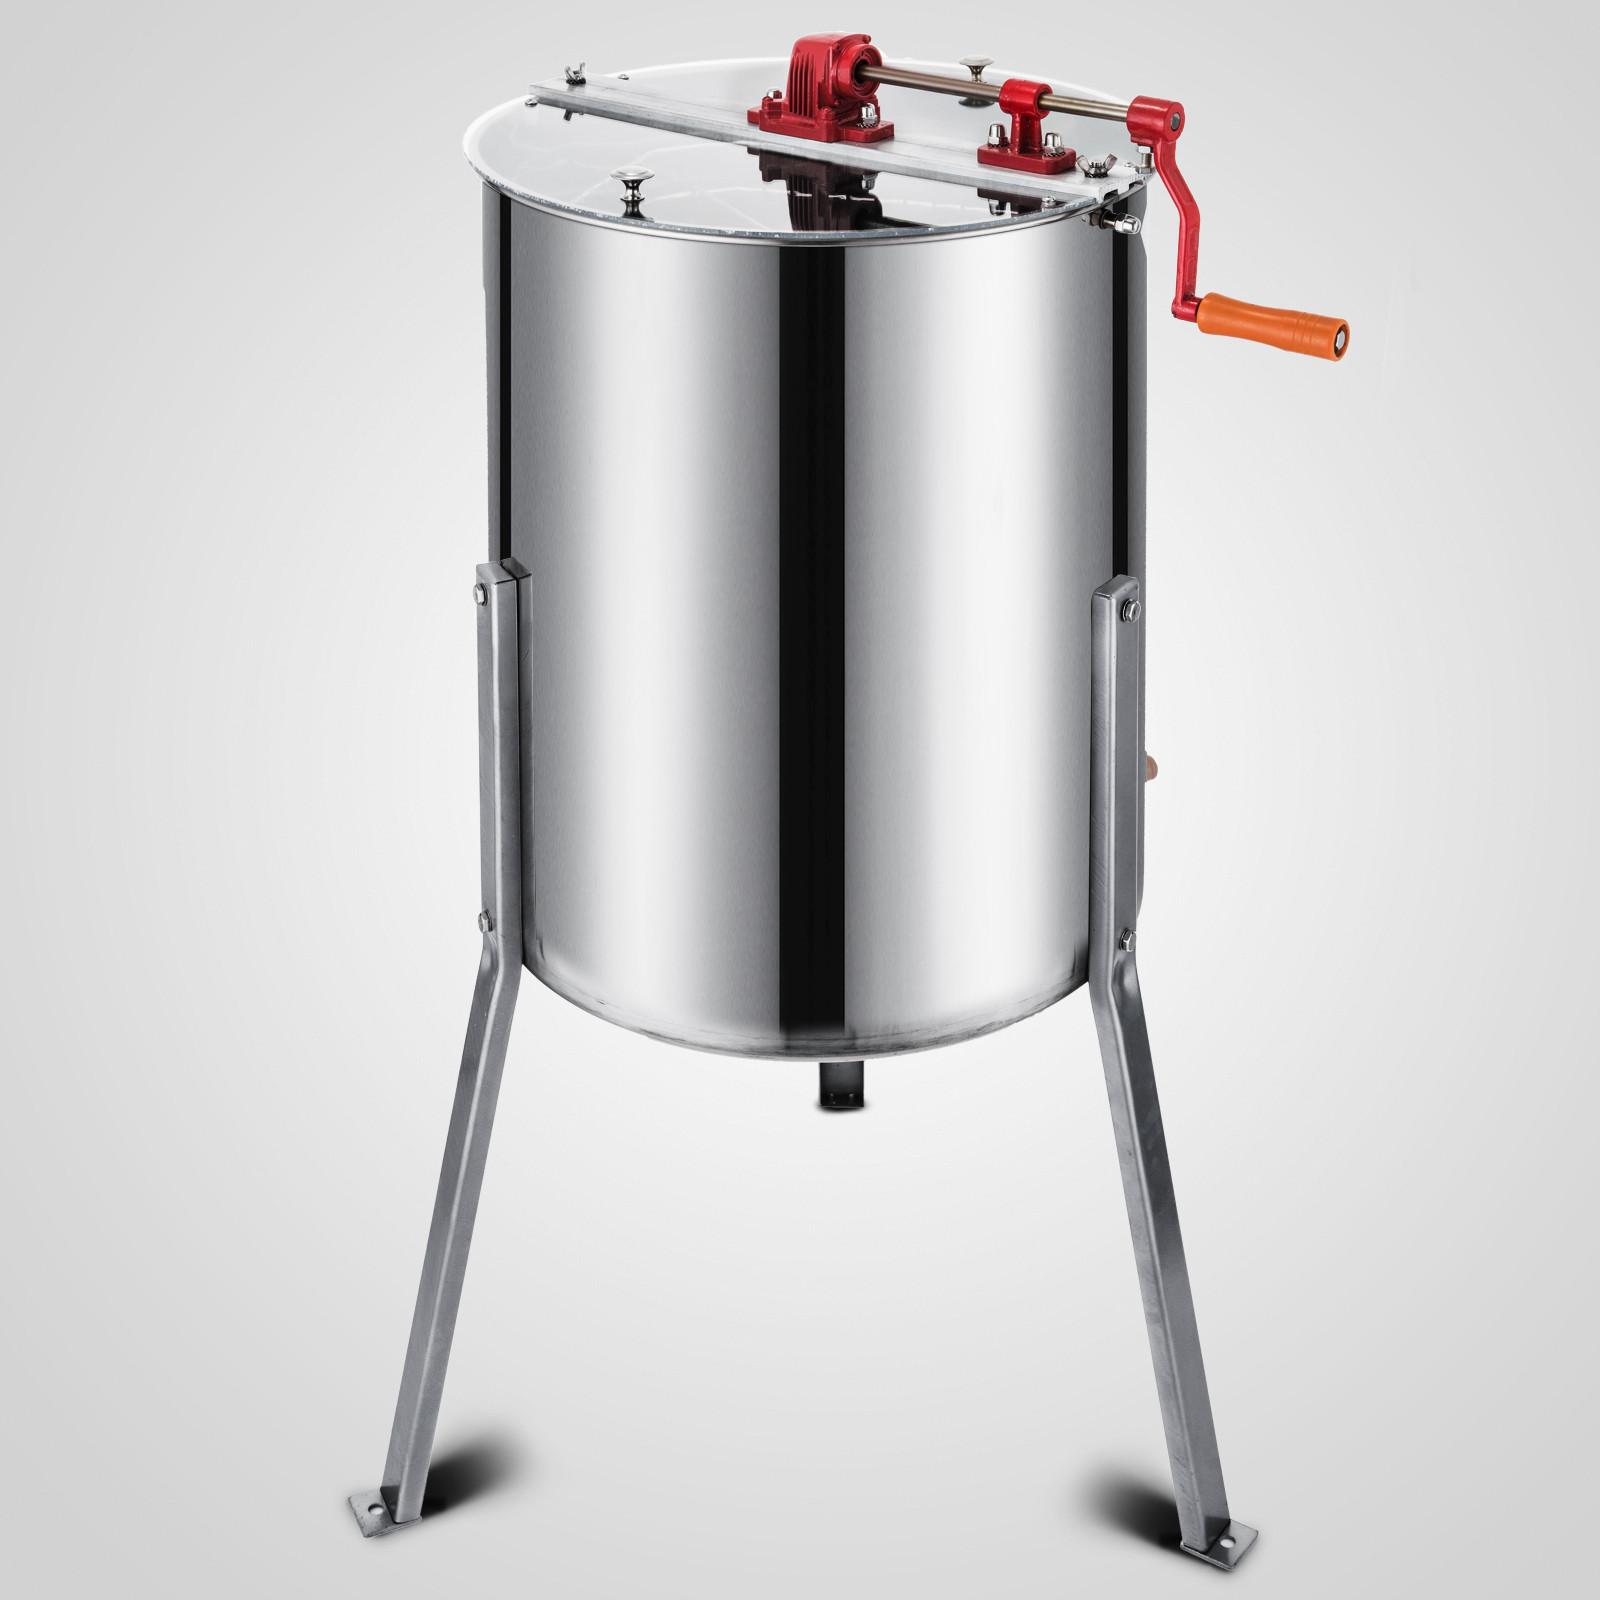 Extracteur-de-Miel-Electrique-manuelle-2-3-4-Cadres-En-Acier-Inox-Centrifugeuse miniature 76